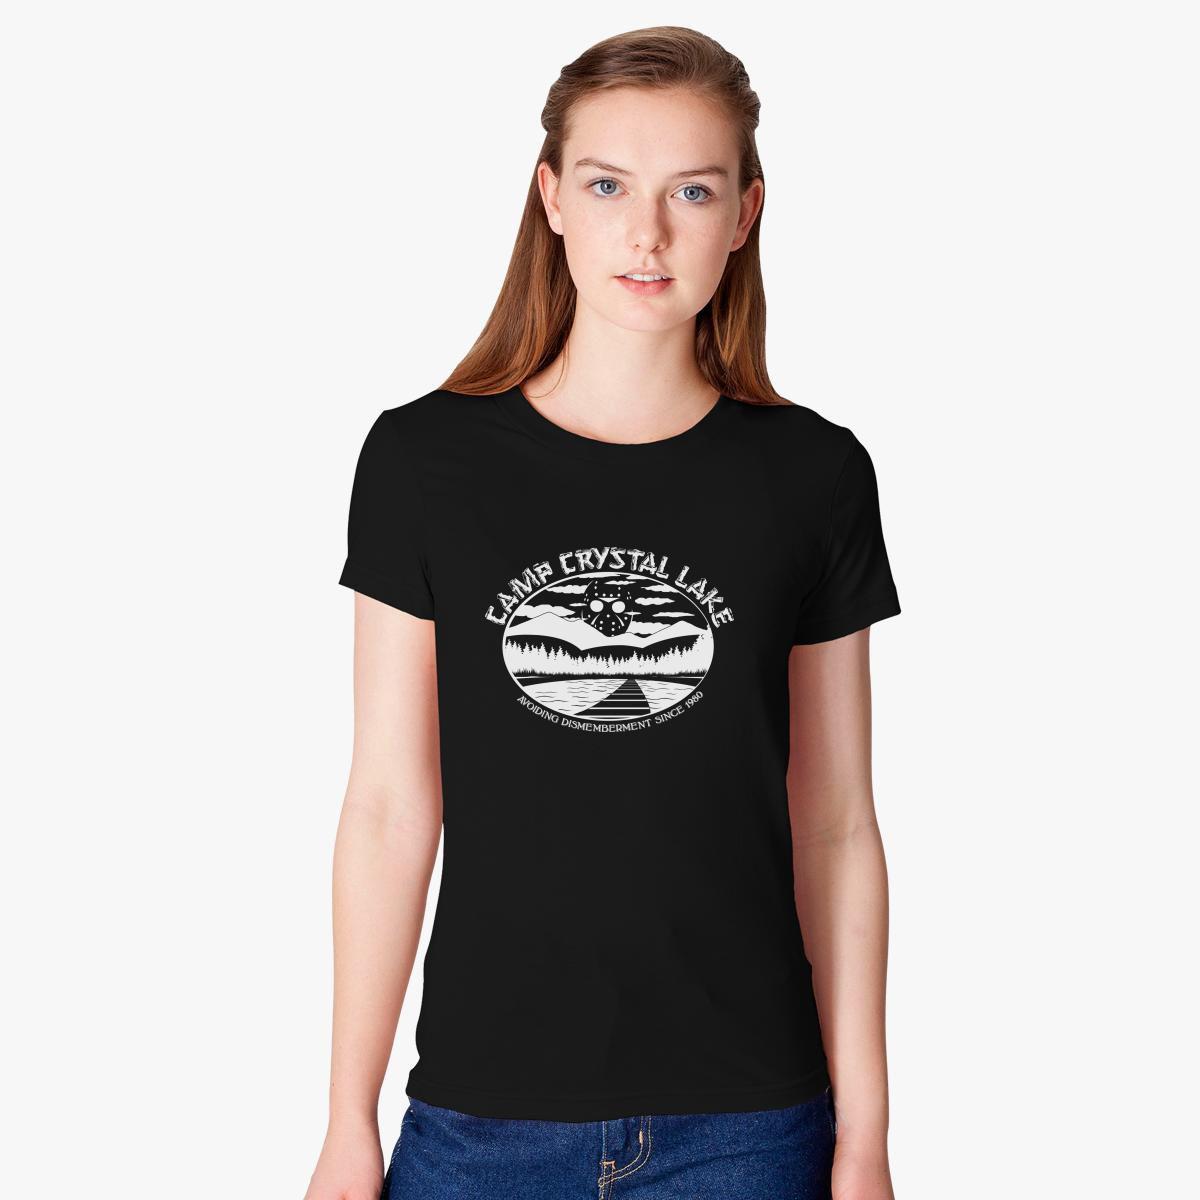 d7eef205c Camp Crystal Lake Friday 13th Women's T-shirt - Customon